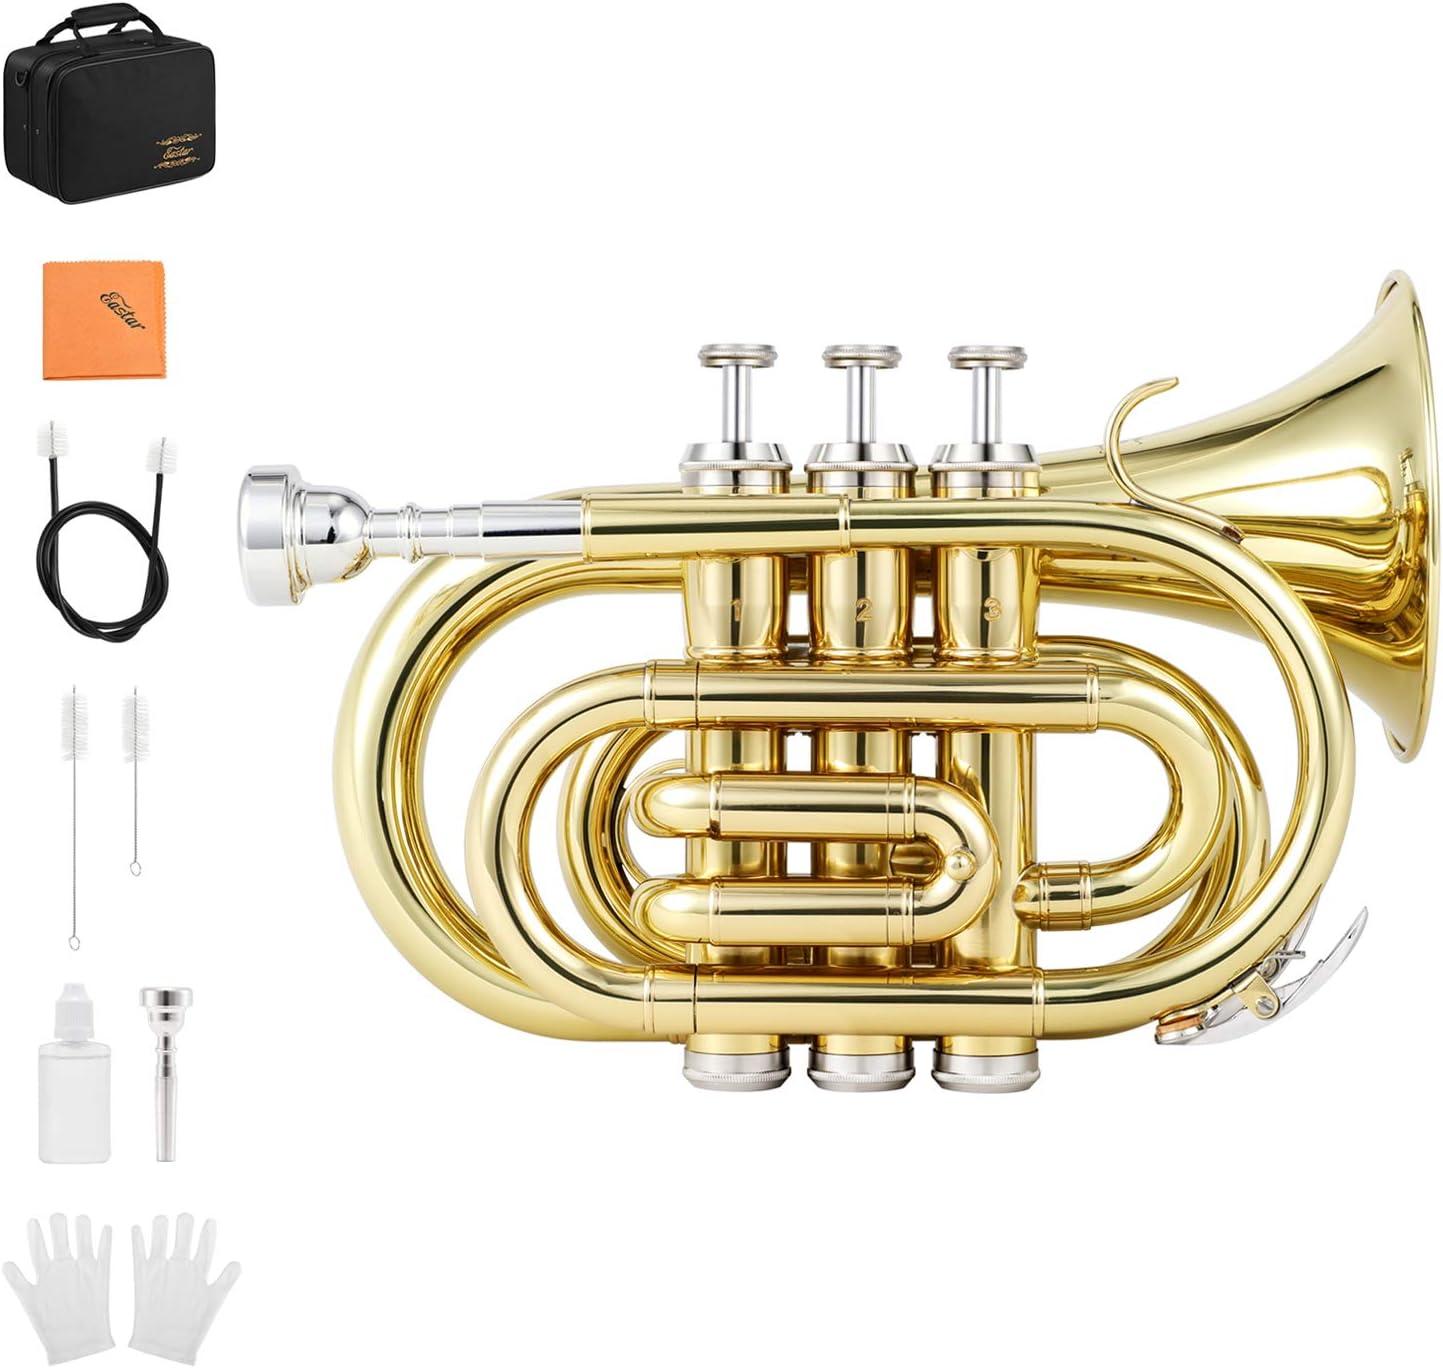 Eastar ETR-330 Pocket Trumpet Bb Gold Lacquer Mini Trumpet B Flat